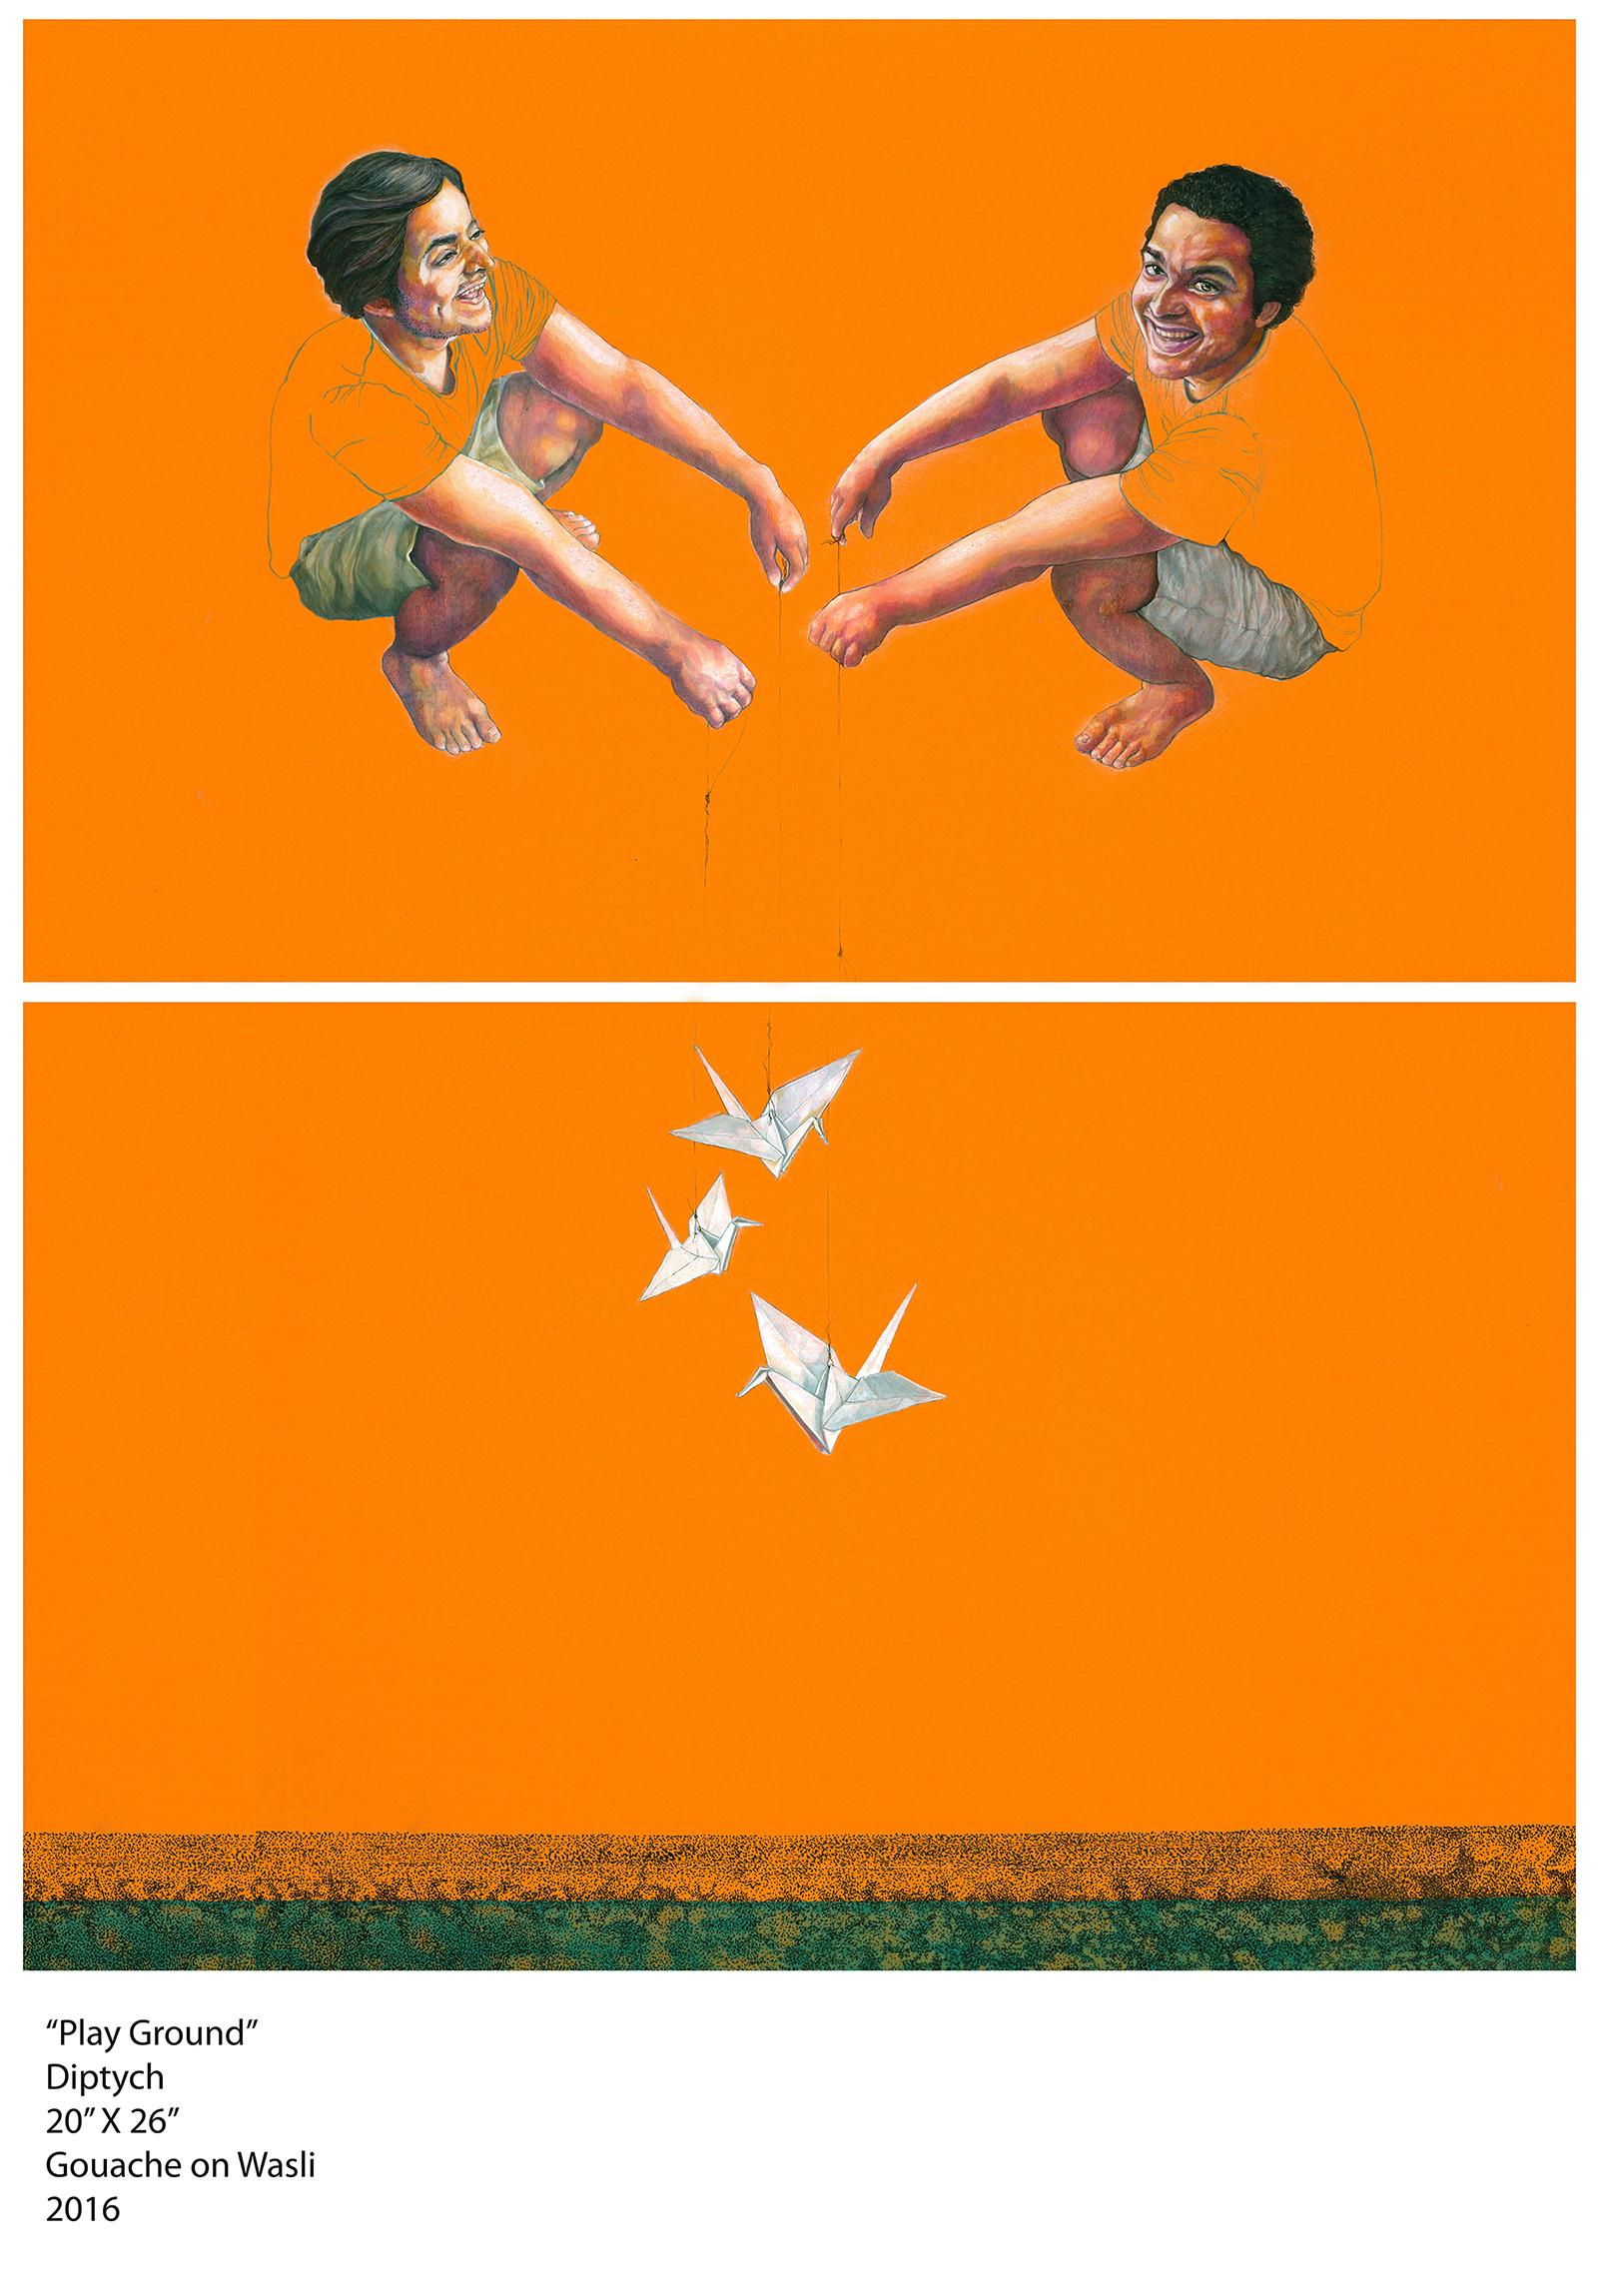 Play Ground/Flightless Bird